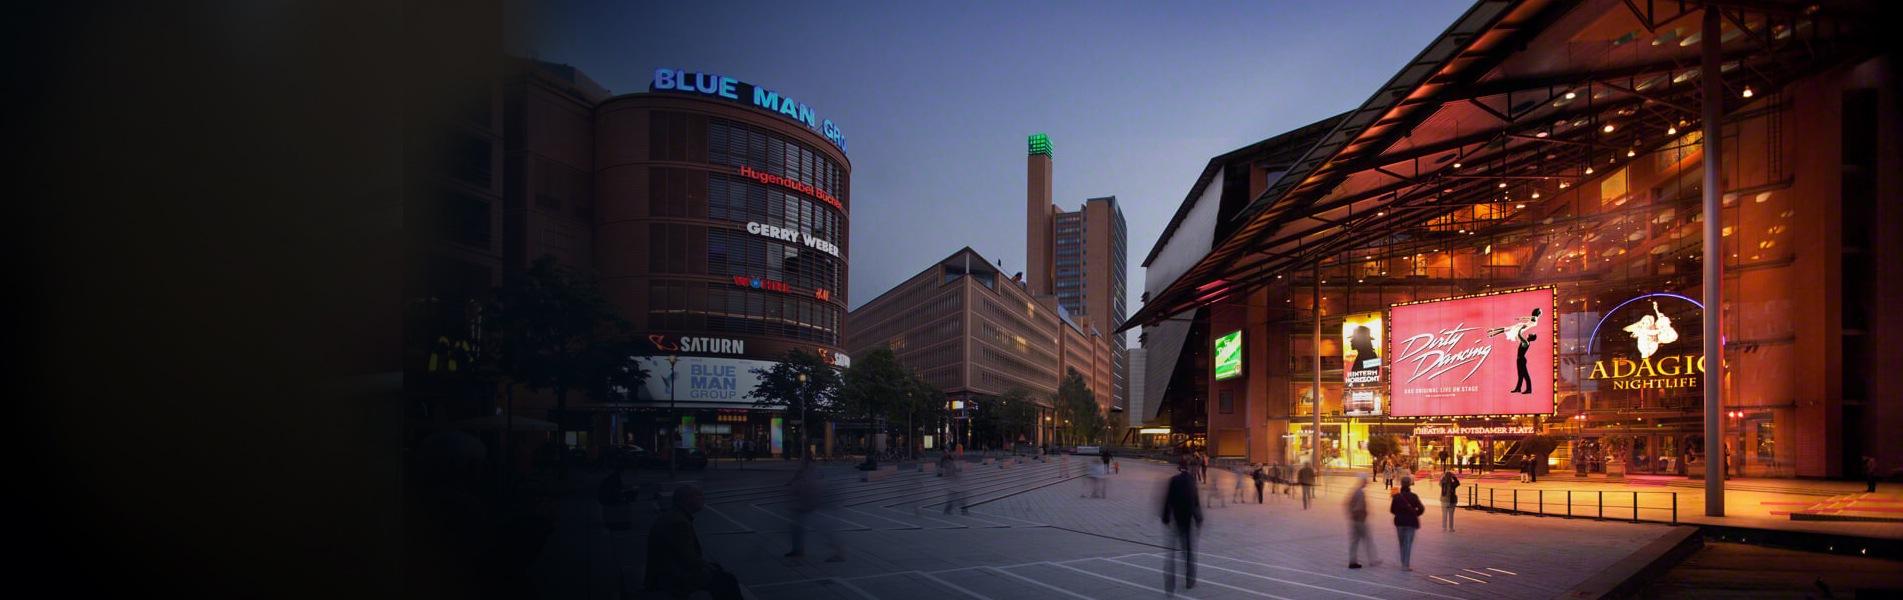 Spielbank Alexanderplatz